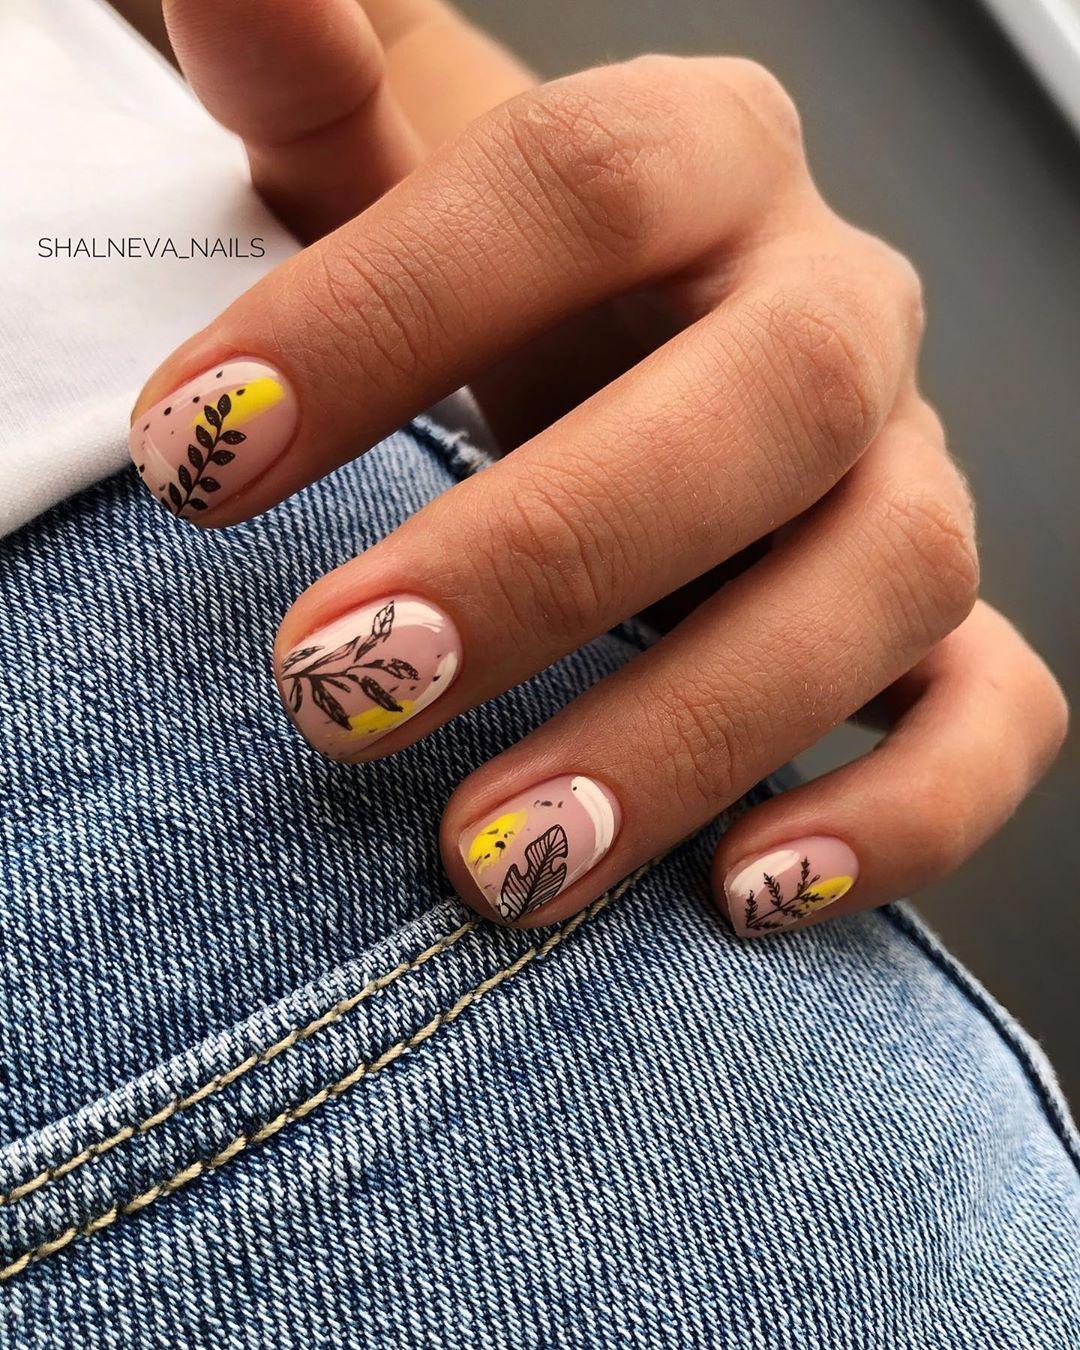 Nails Glitternails Gelnails Coffinnails Nails Nailswag Nailstagram Nailart Naildesigns Nailaddict Nails Osennie Nogti Nogti Nogti Mindalevidnoj Formy